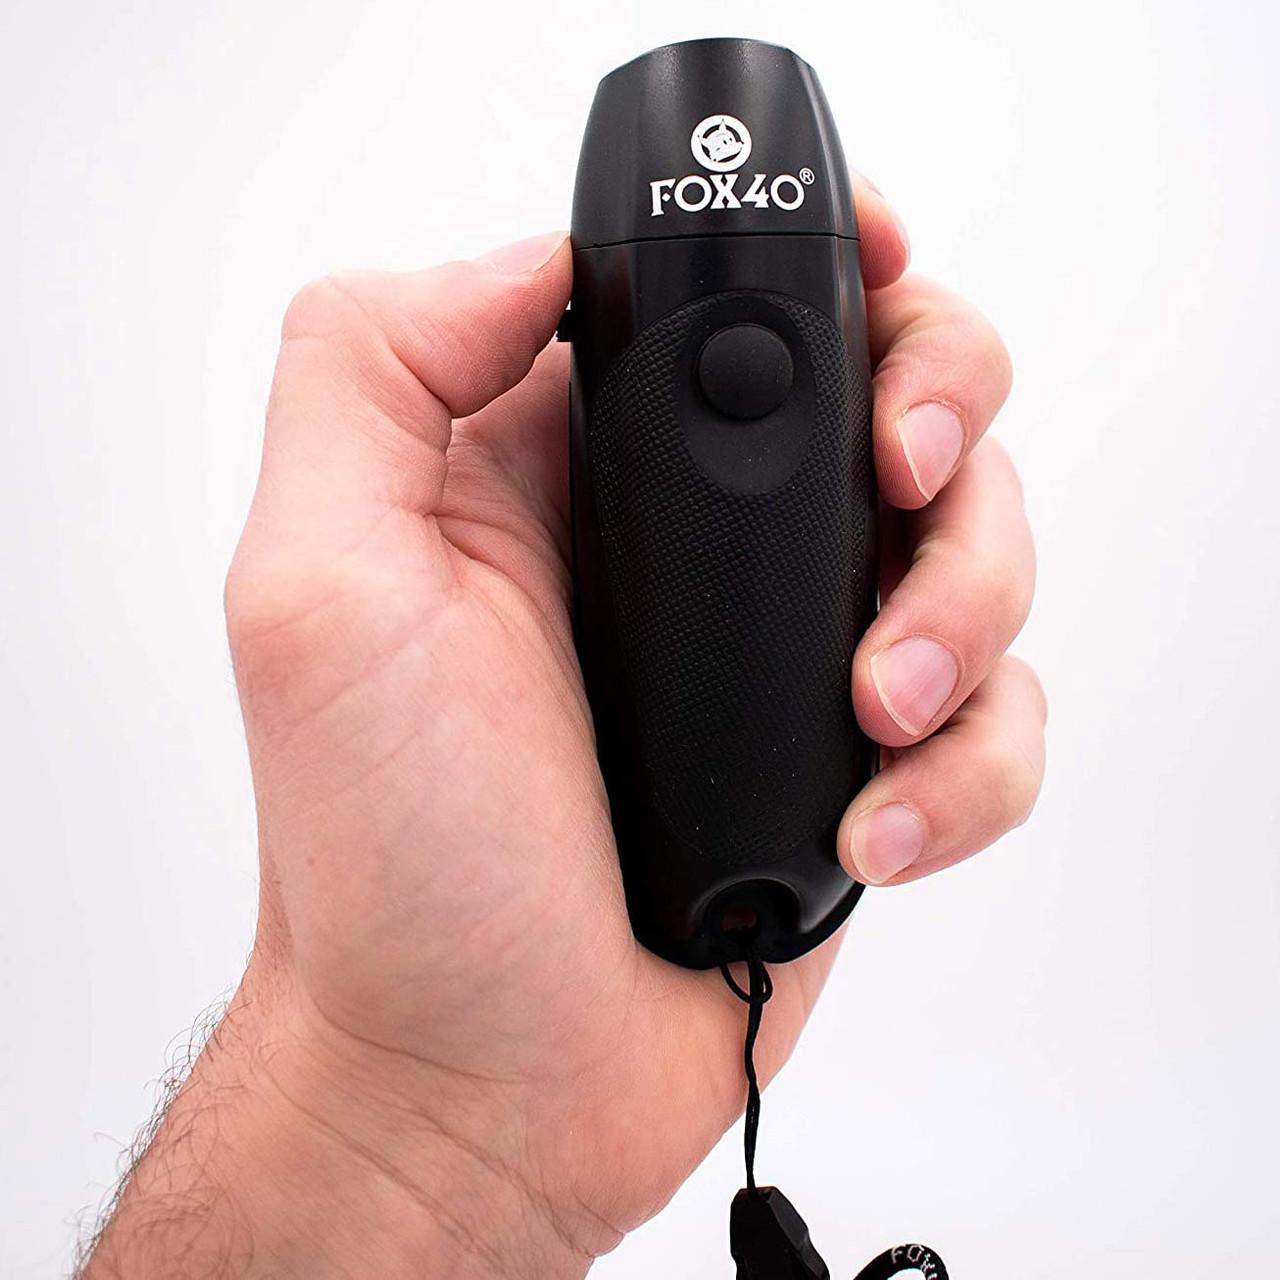 Fox 40 Three Tone Electronic Whistle - Black